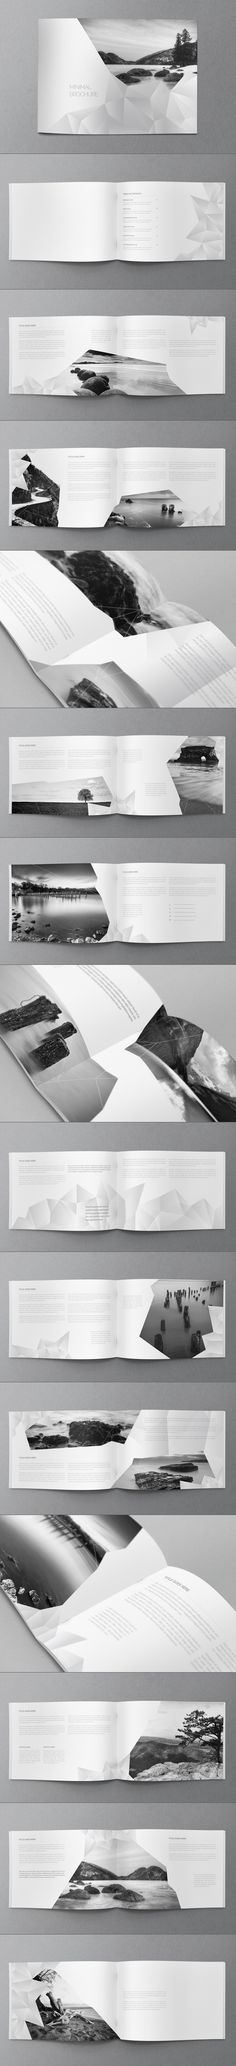 White Minimal Brochure. Download here: http://graphicriver.net/item/white-minimal-brochure/8285896?ref=abradesign #design #brochure